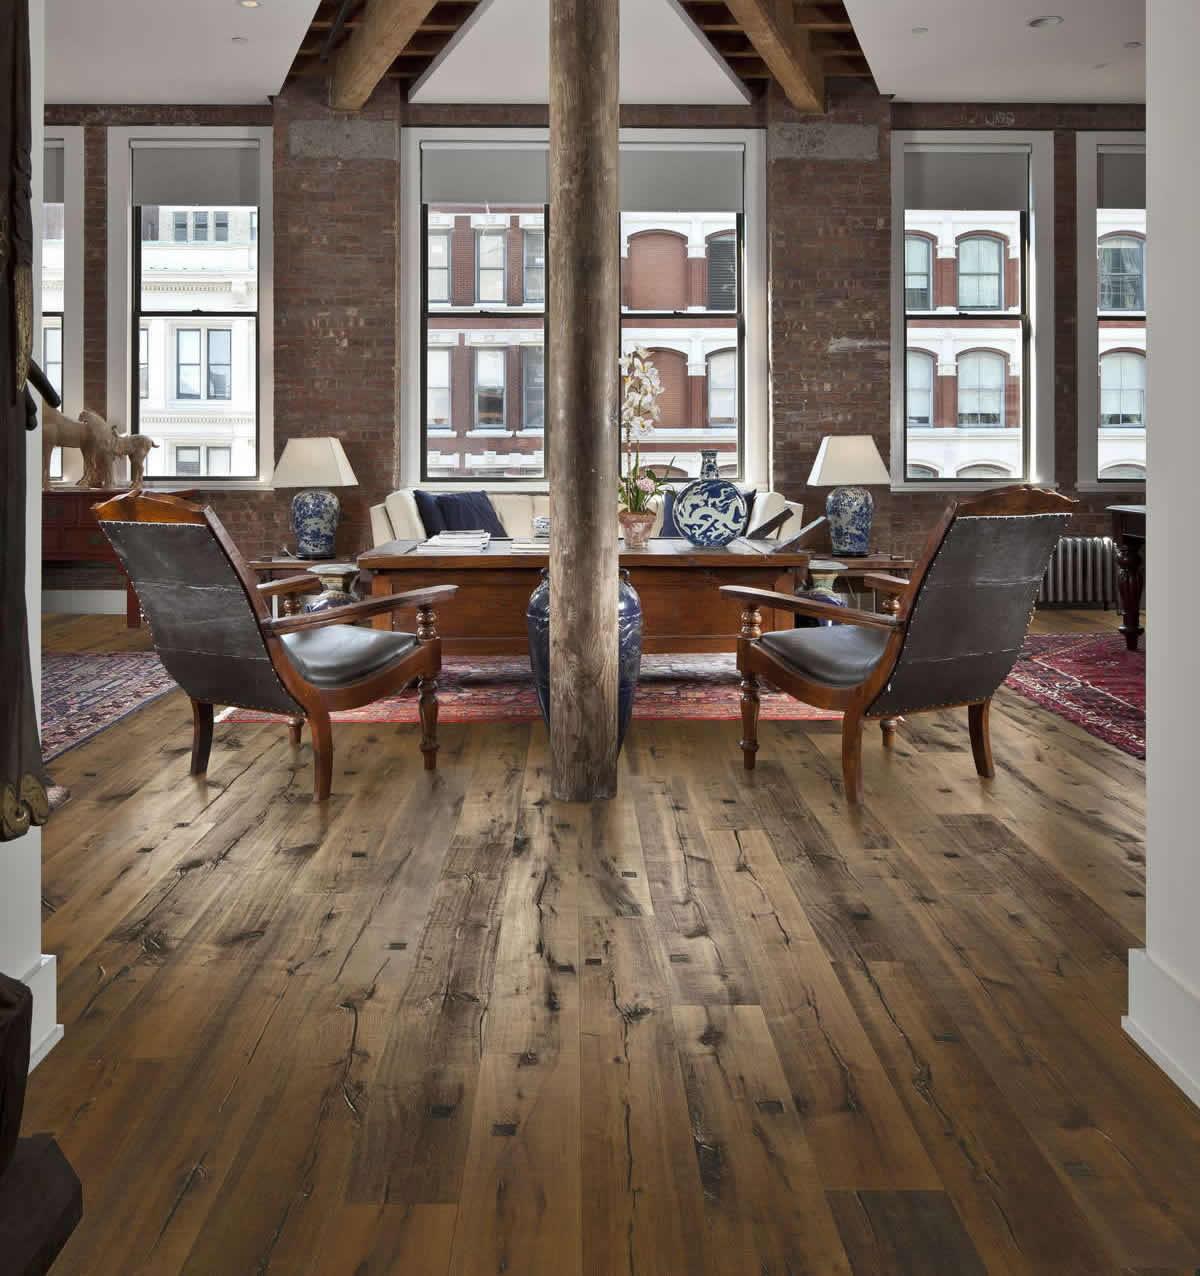 interiors and flooring inspiration delight design floor k kahrs scandinavian gb en wood floors hrs light white vista stories